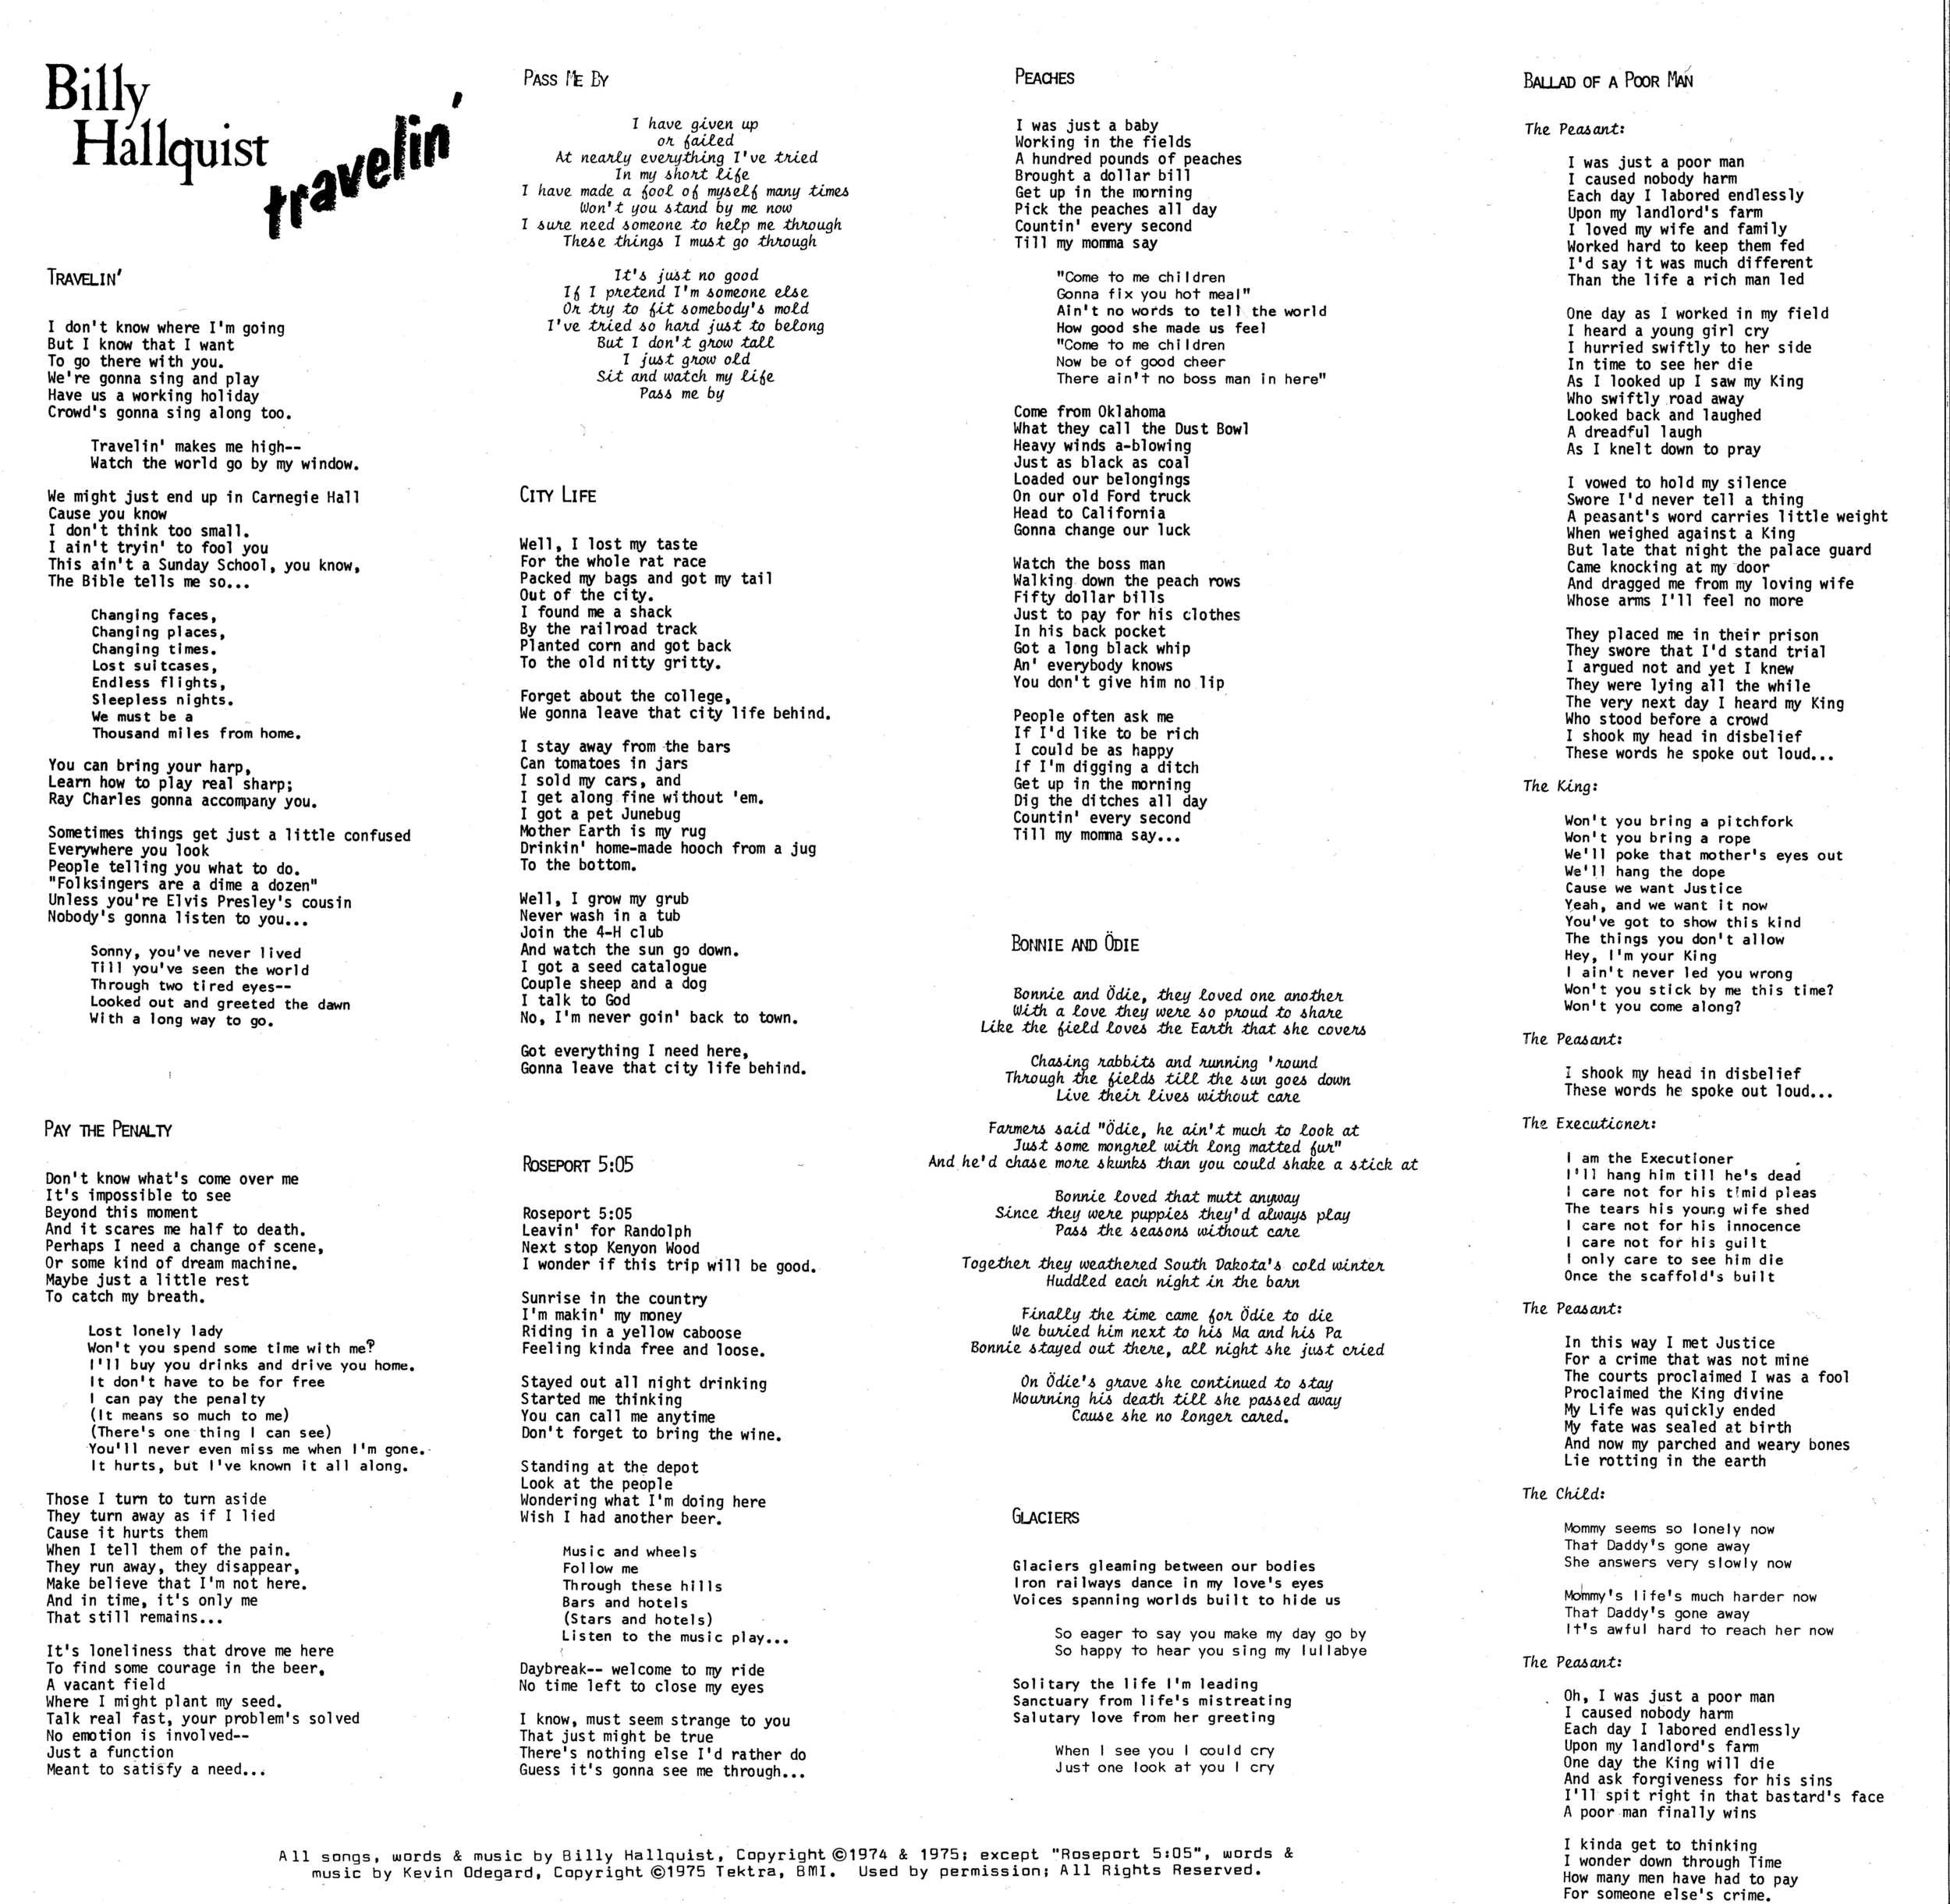 Billy Hallquist - Travelin' - Vinyl Liner Notes (1976) With Lyrics